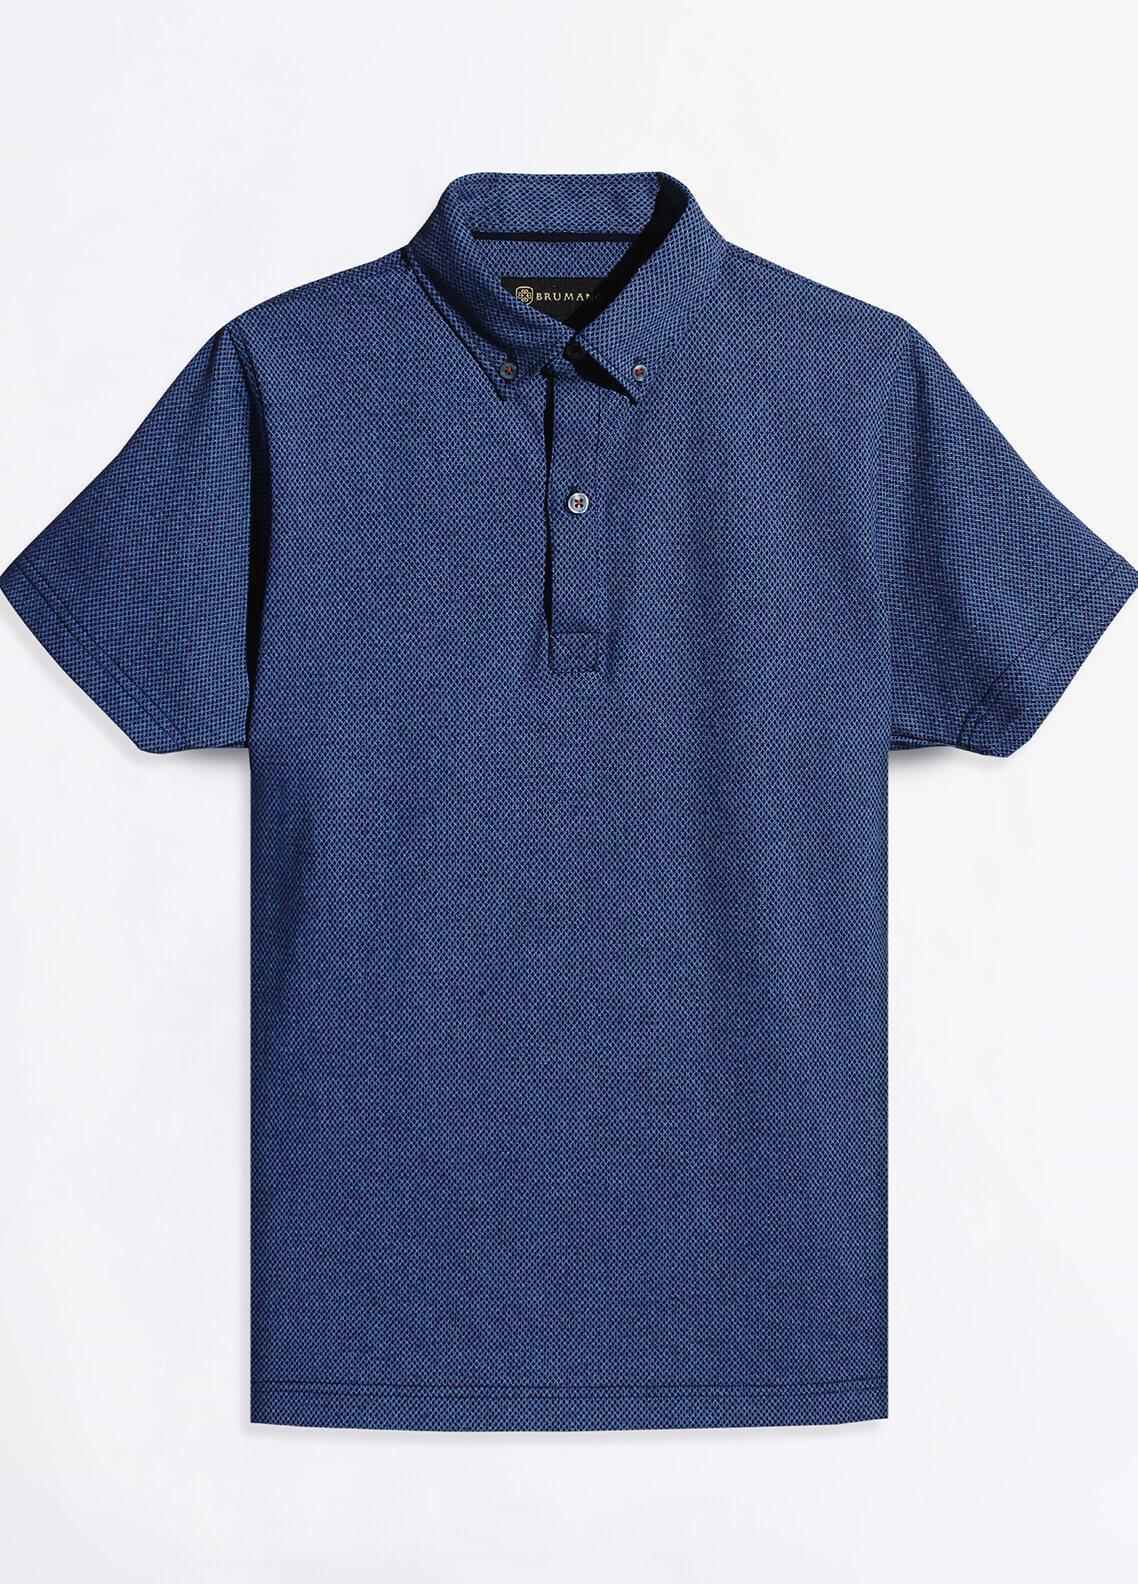 Brumano Cotton Polo Shirts for Men - Navy Blue BRM-981